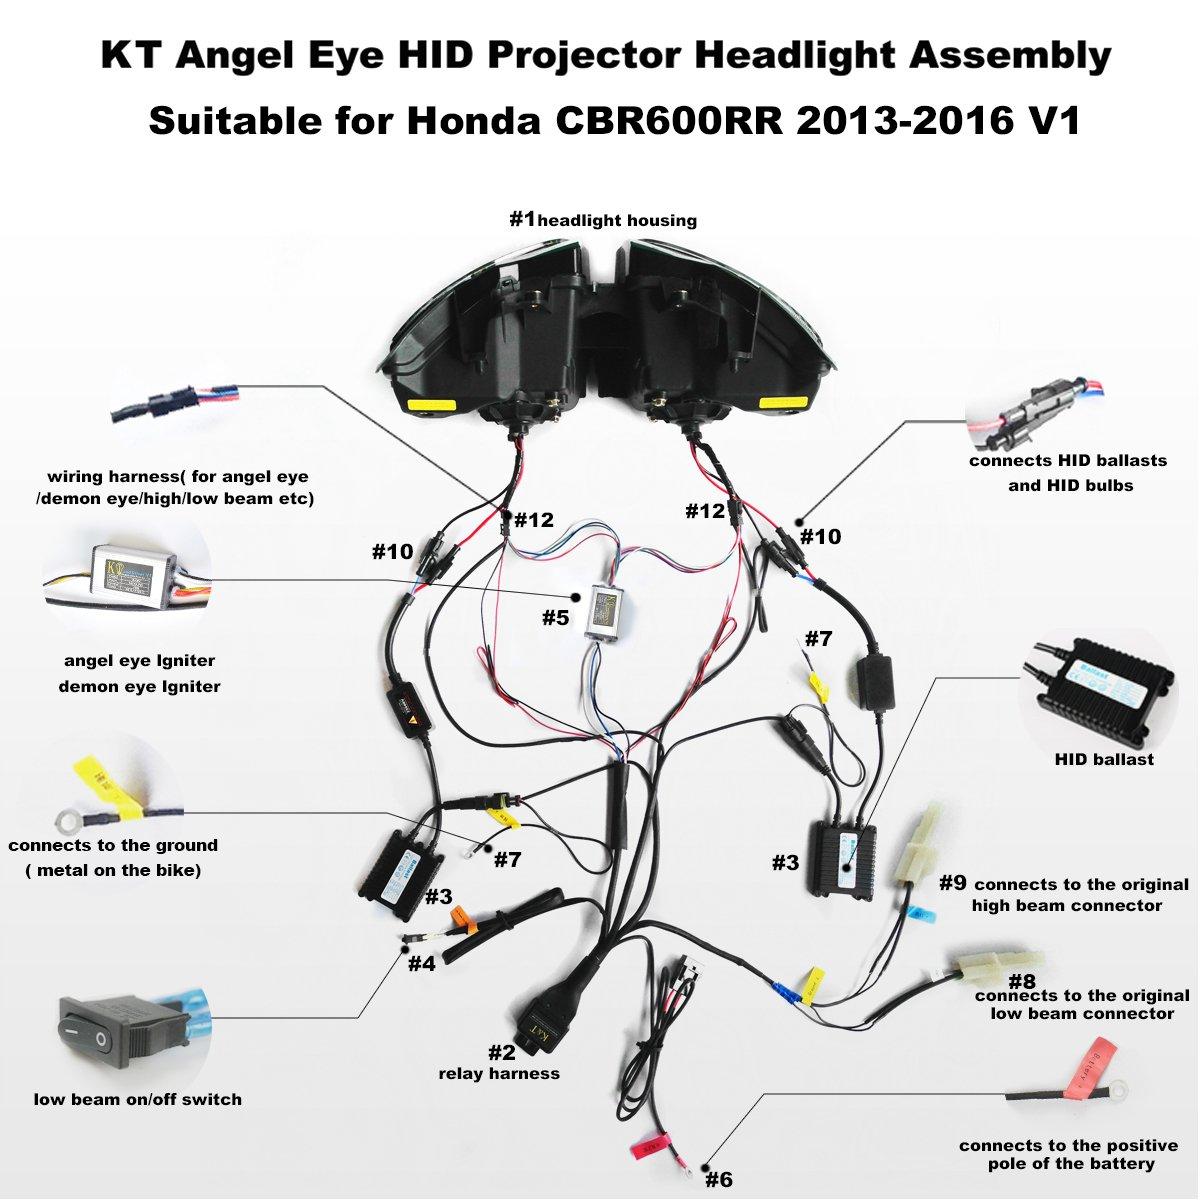 Amazon.com: KT LED Angel Eye Headlight embly for Honda ... on